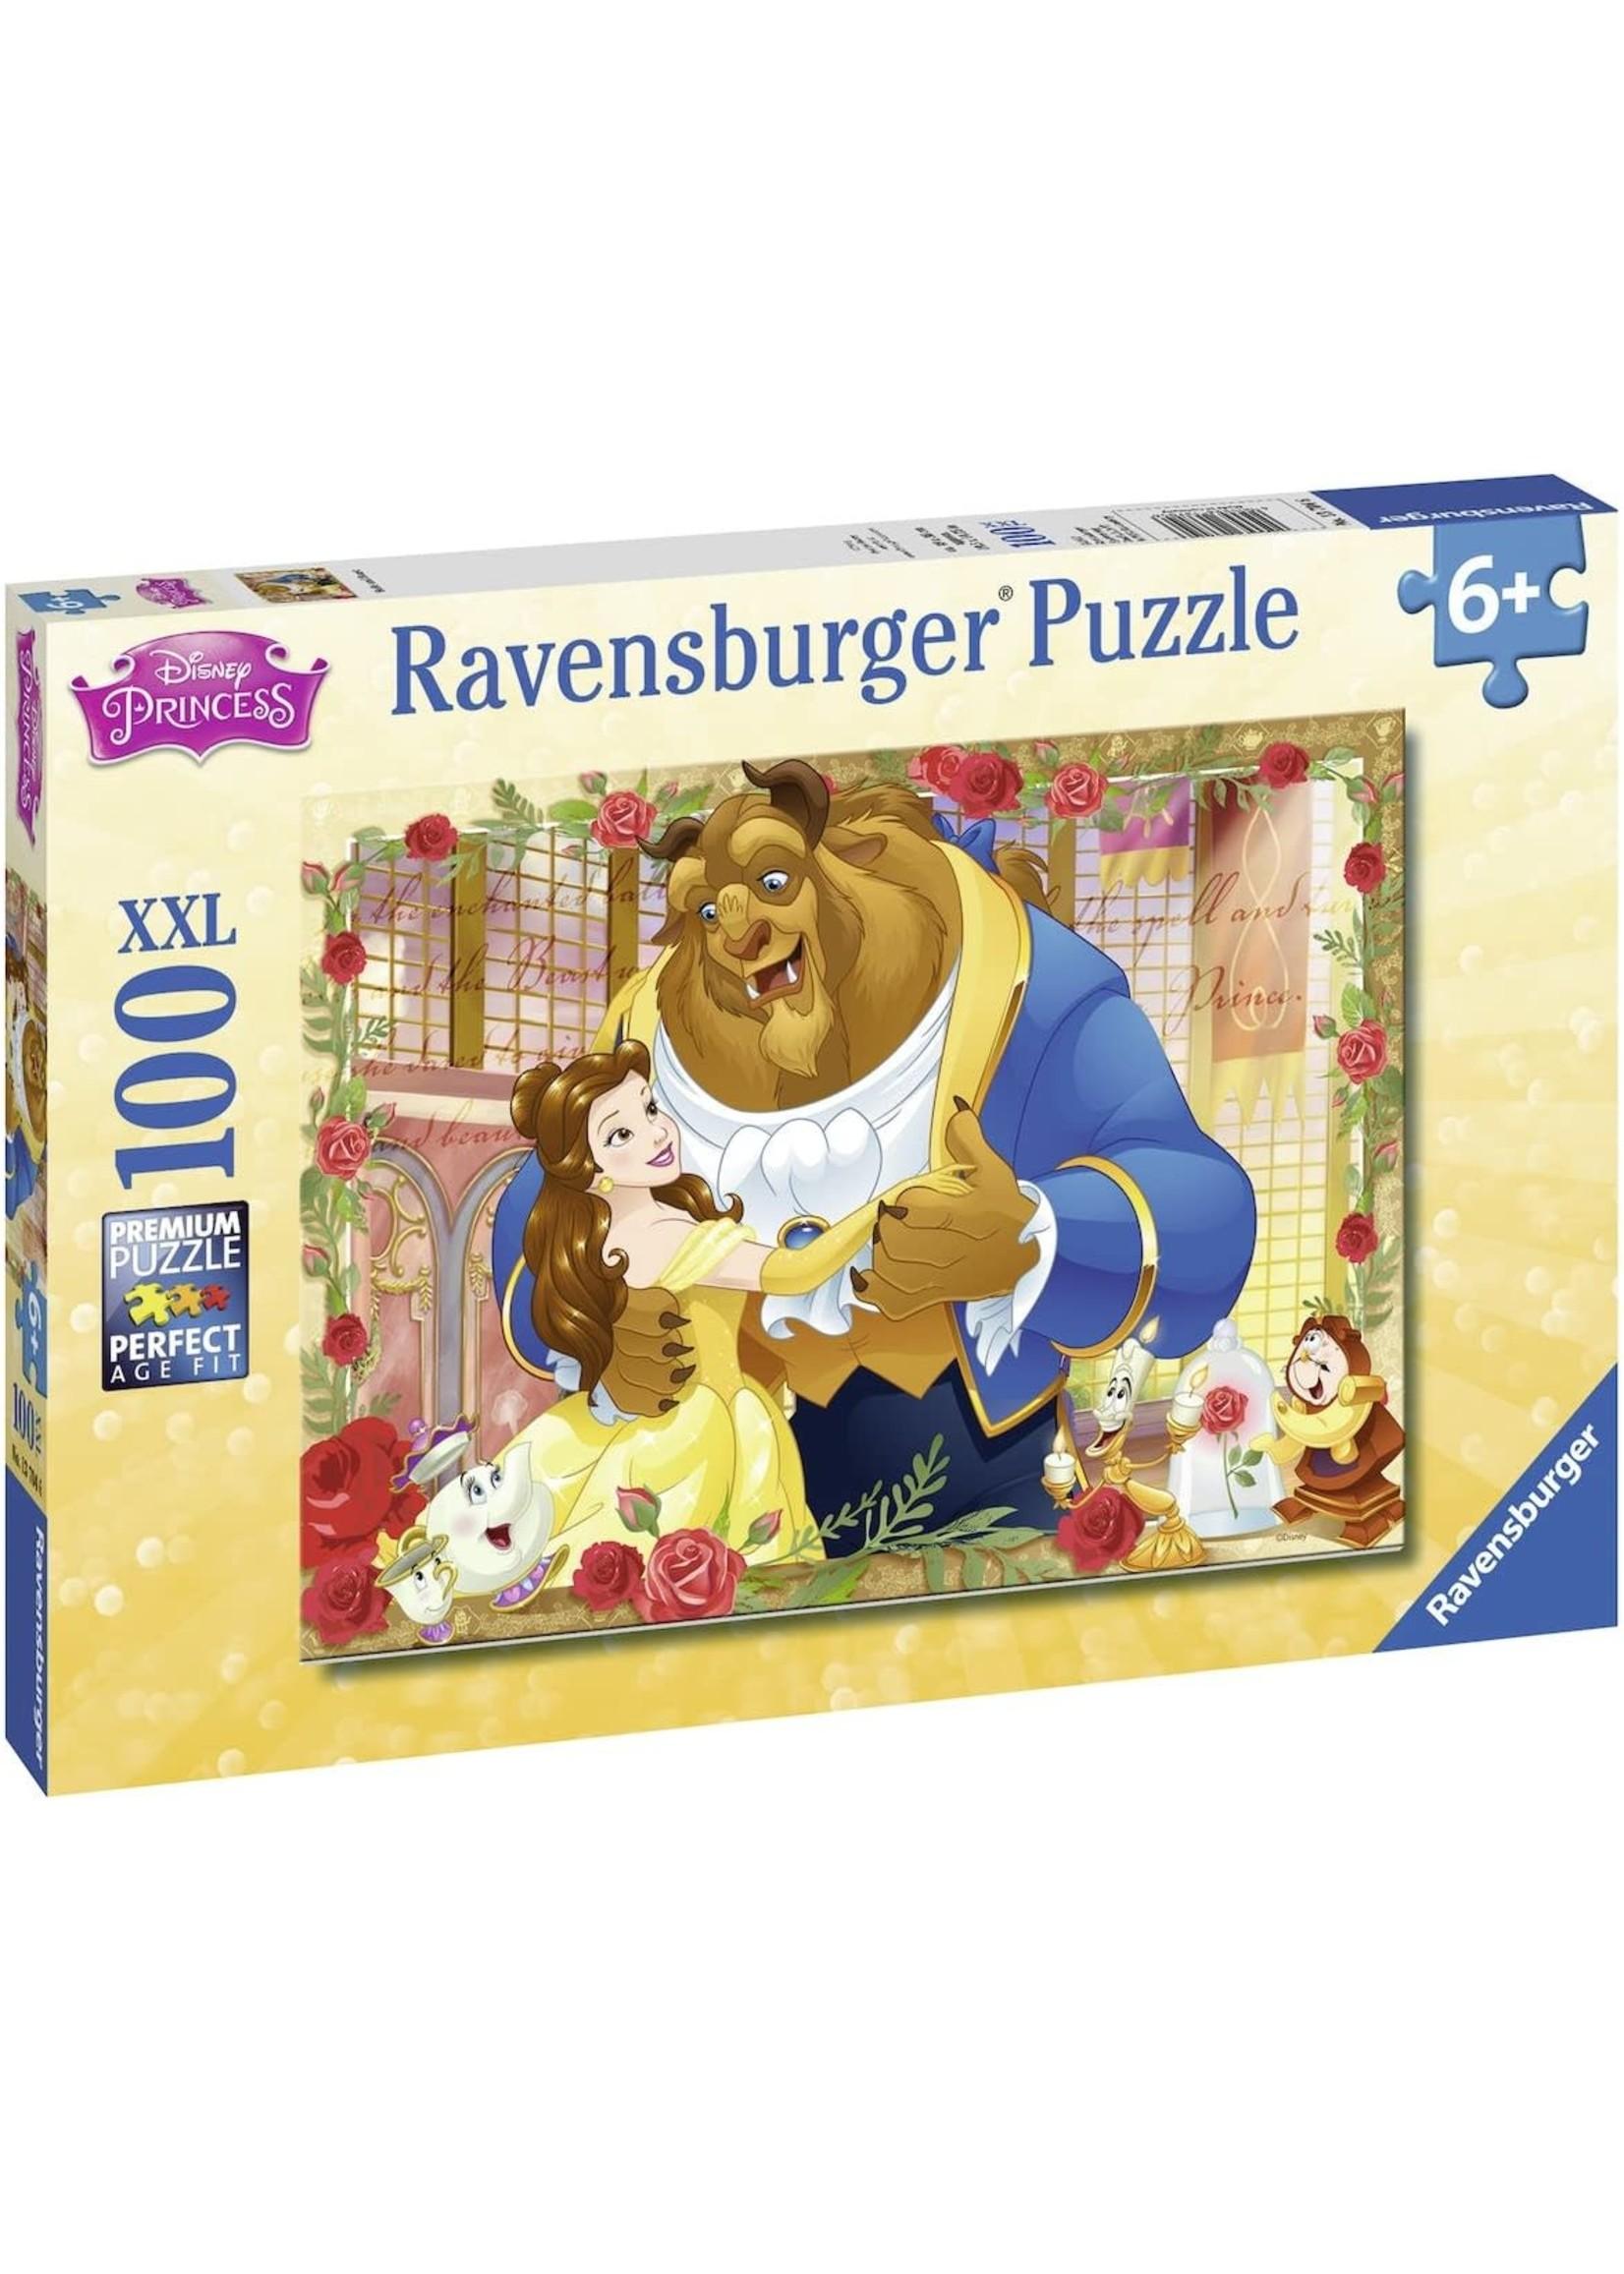 Ravensburger 100pc XXL puzzle Belle & Beast